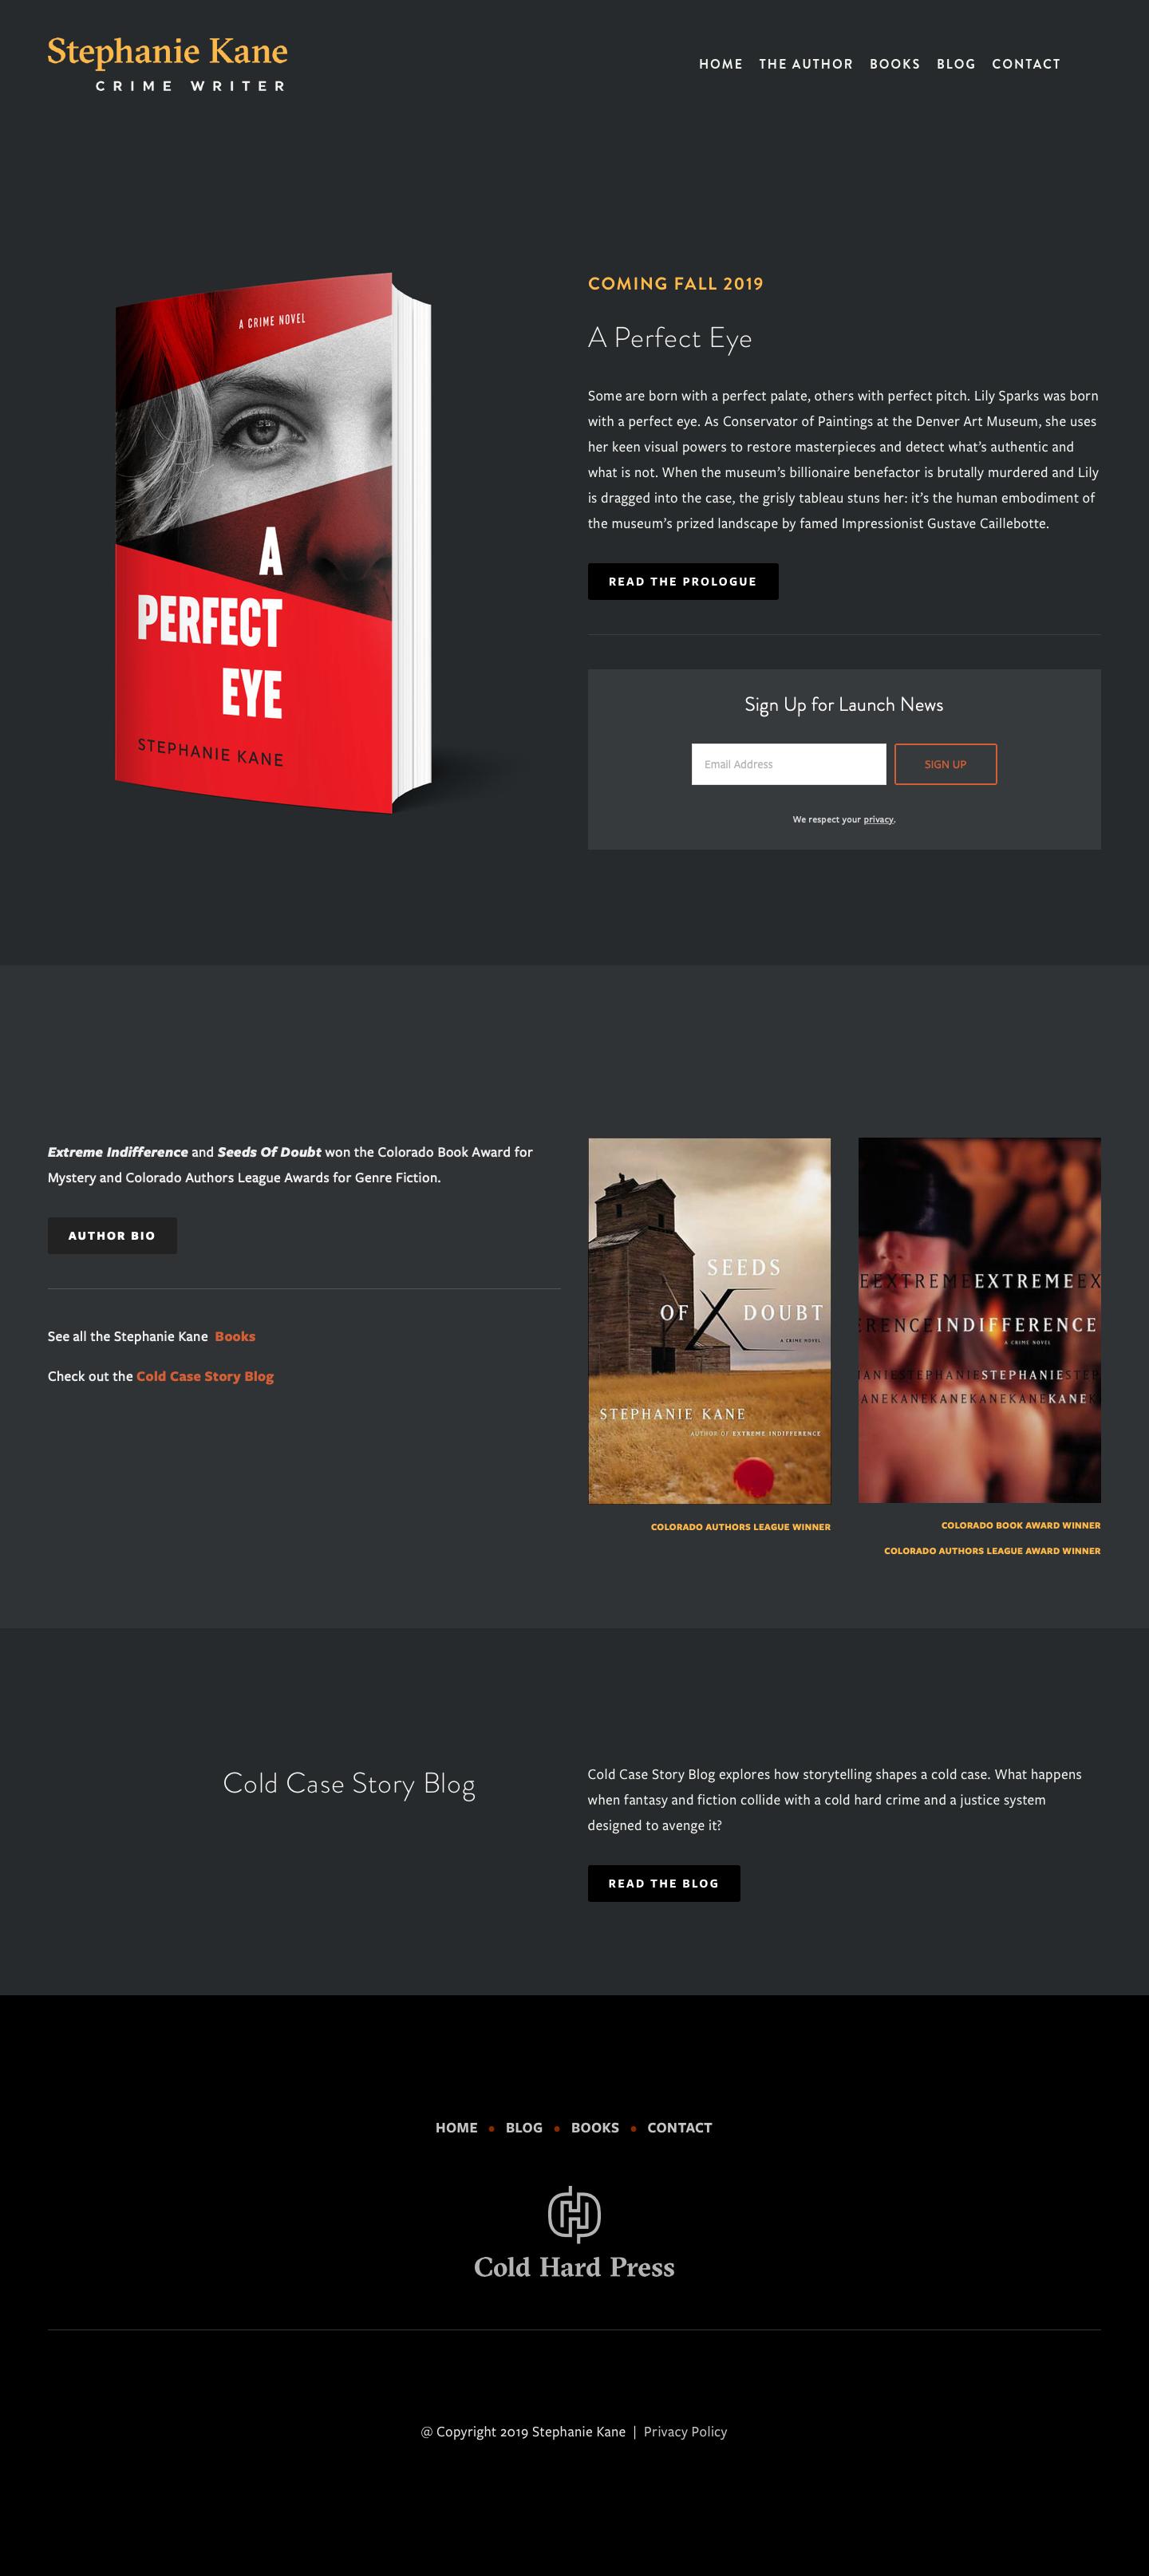 stephanie-kane-web-site.png